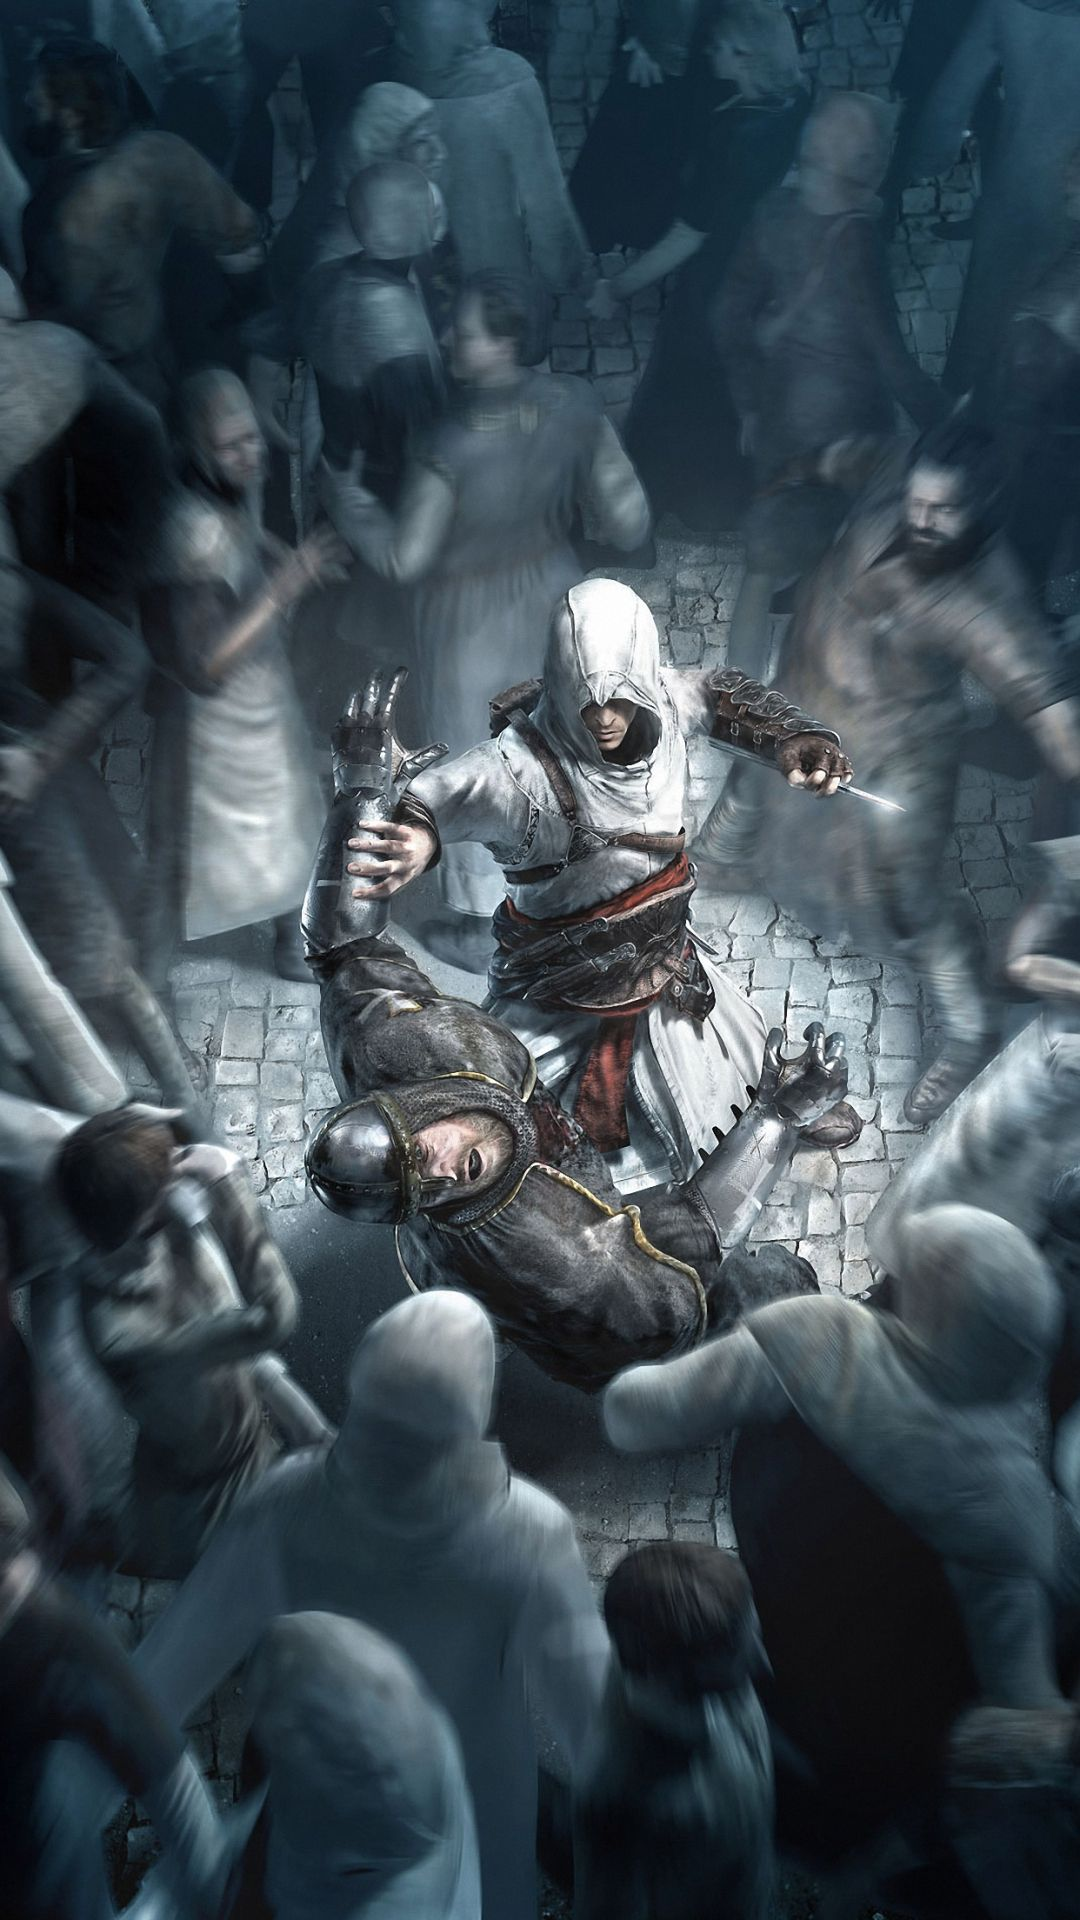 AssassinsCreed EzioAuditore assassinscreed assassi